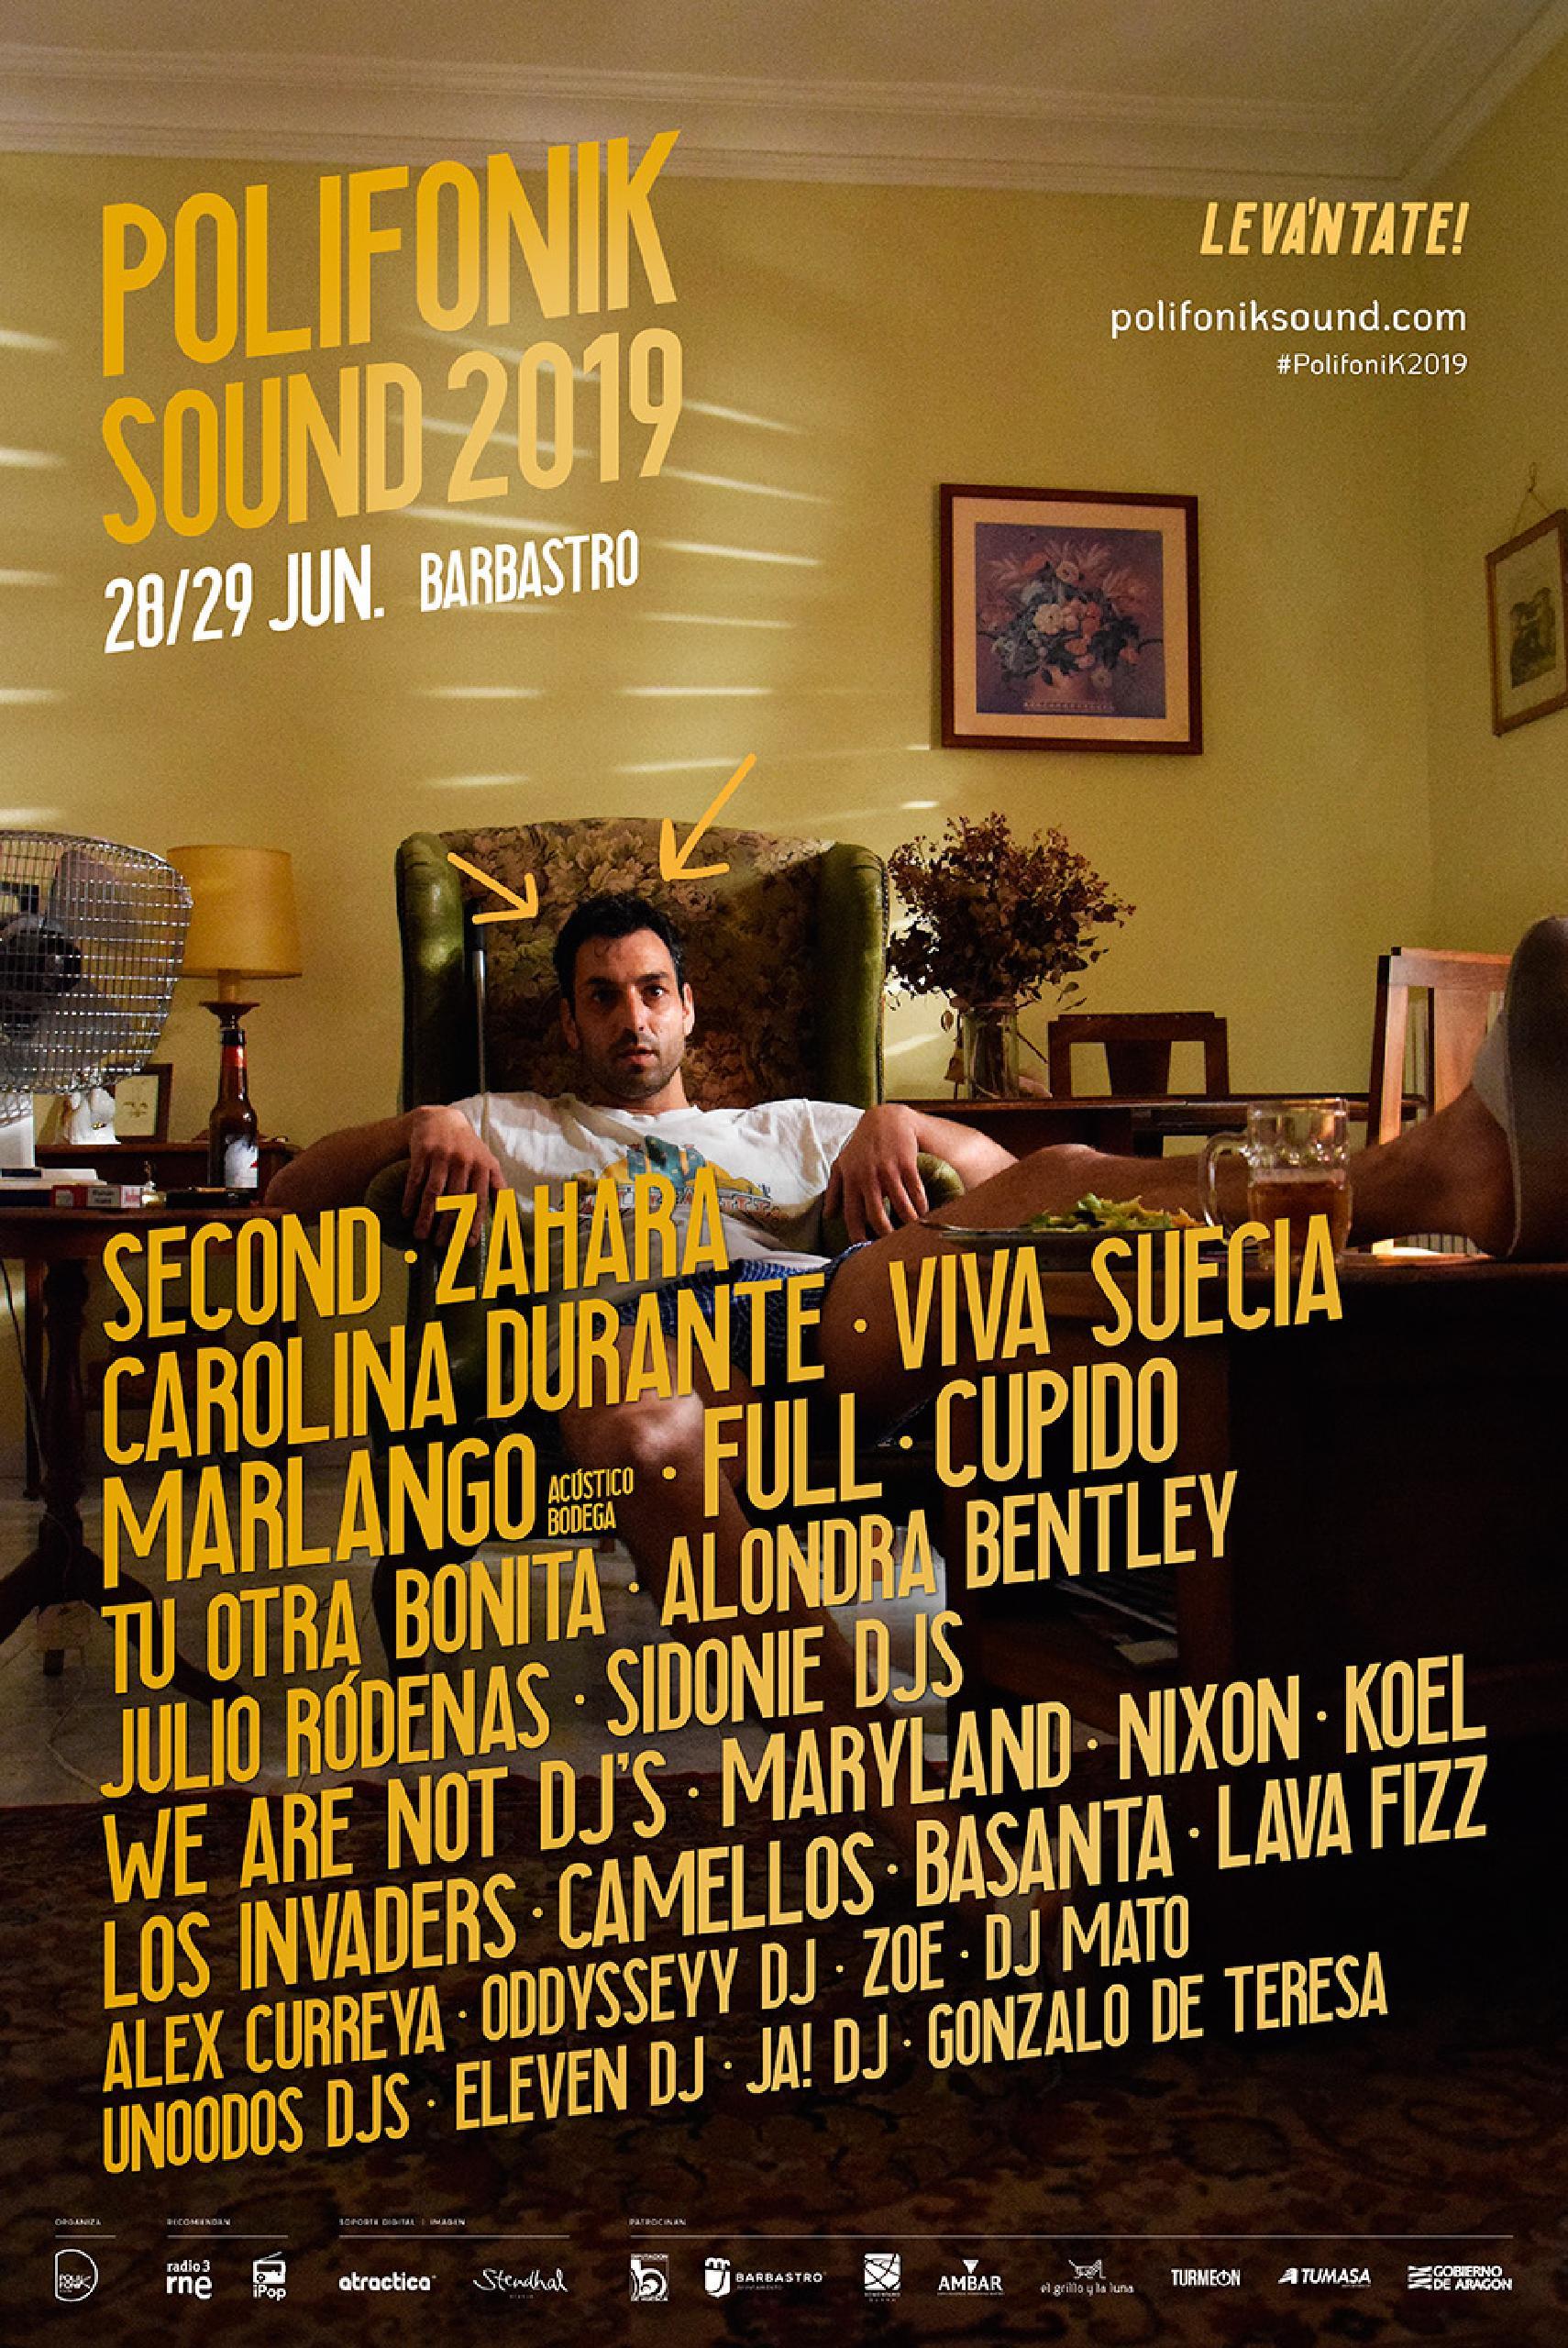 Polifonik Sound 2019 Cartel 1